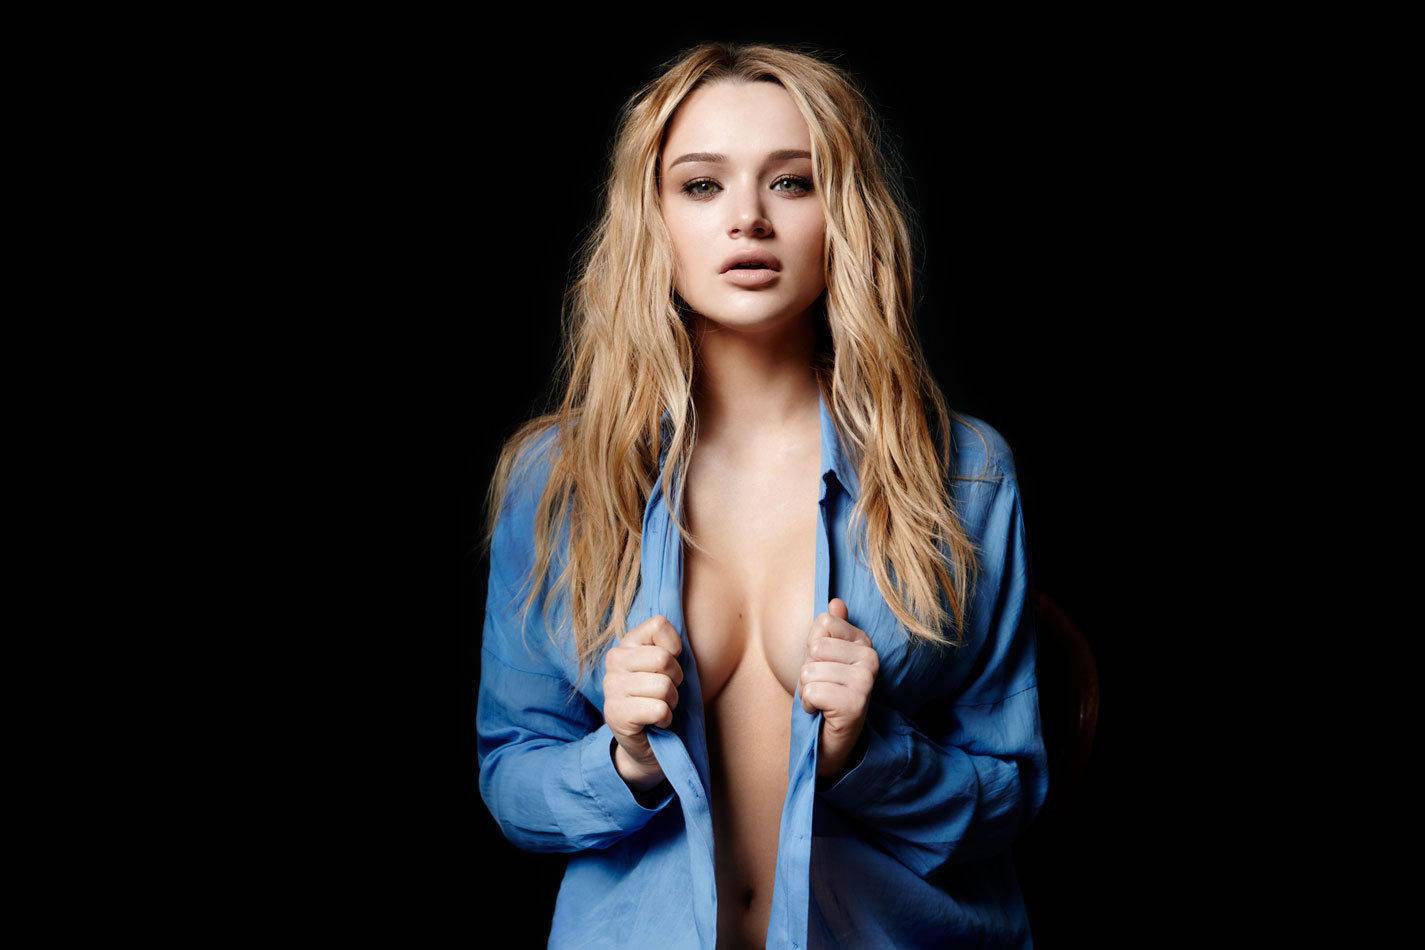 Caitriona balfe nude sex in outlander scandalplanetcom Part 6 5